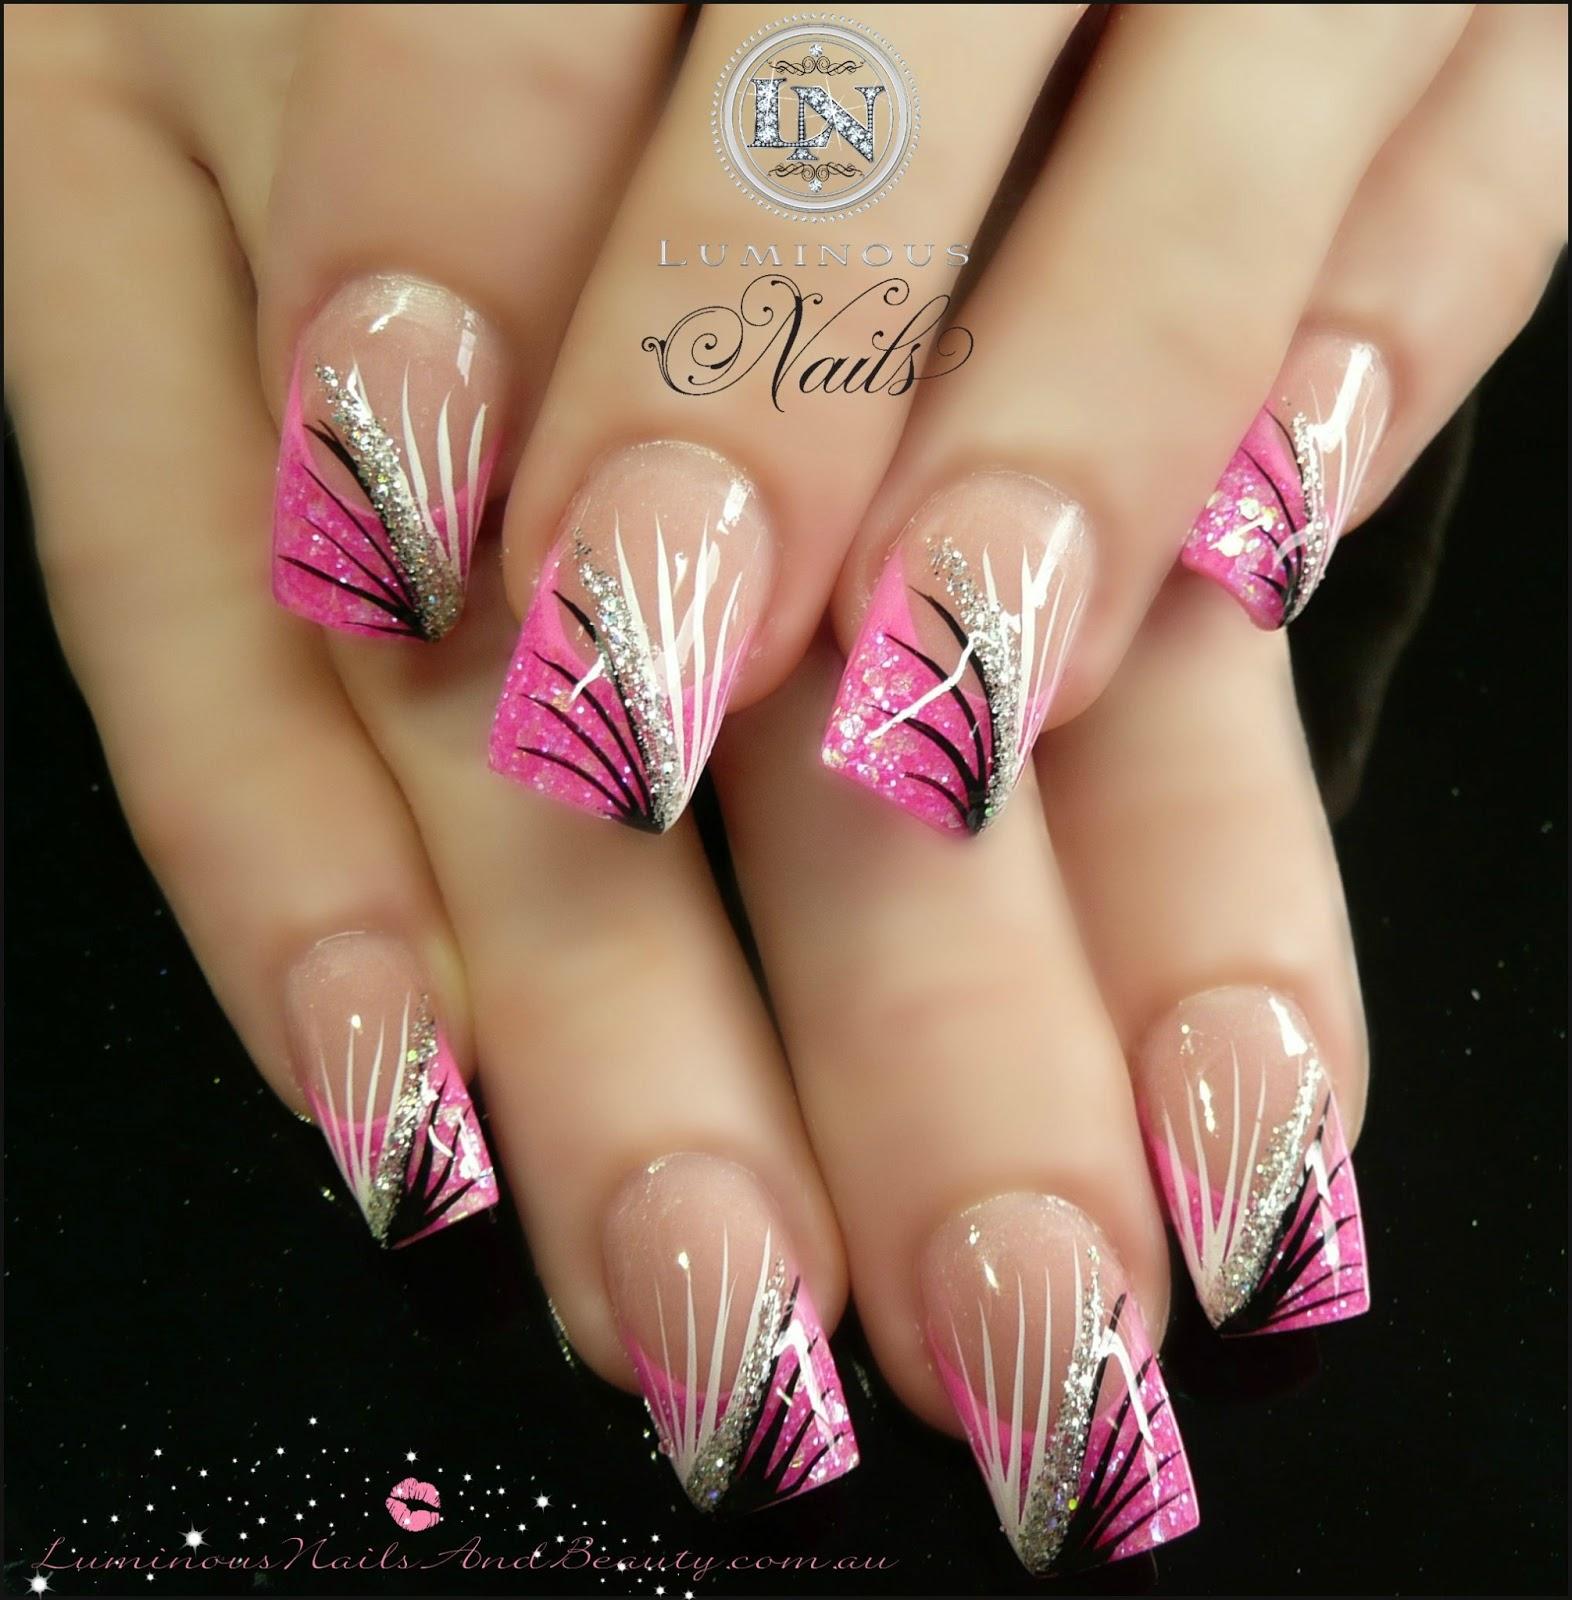 Luminous Nails: April 2013